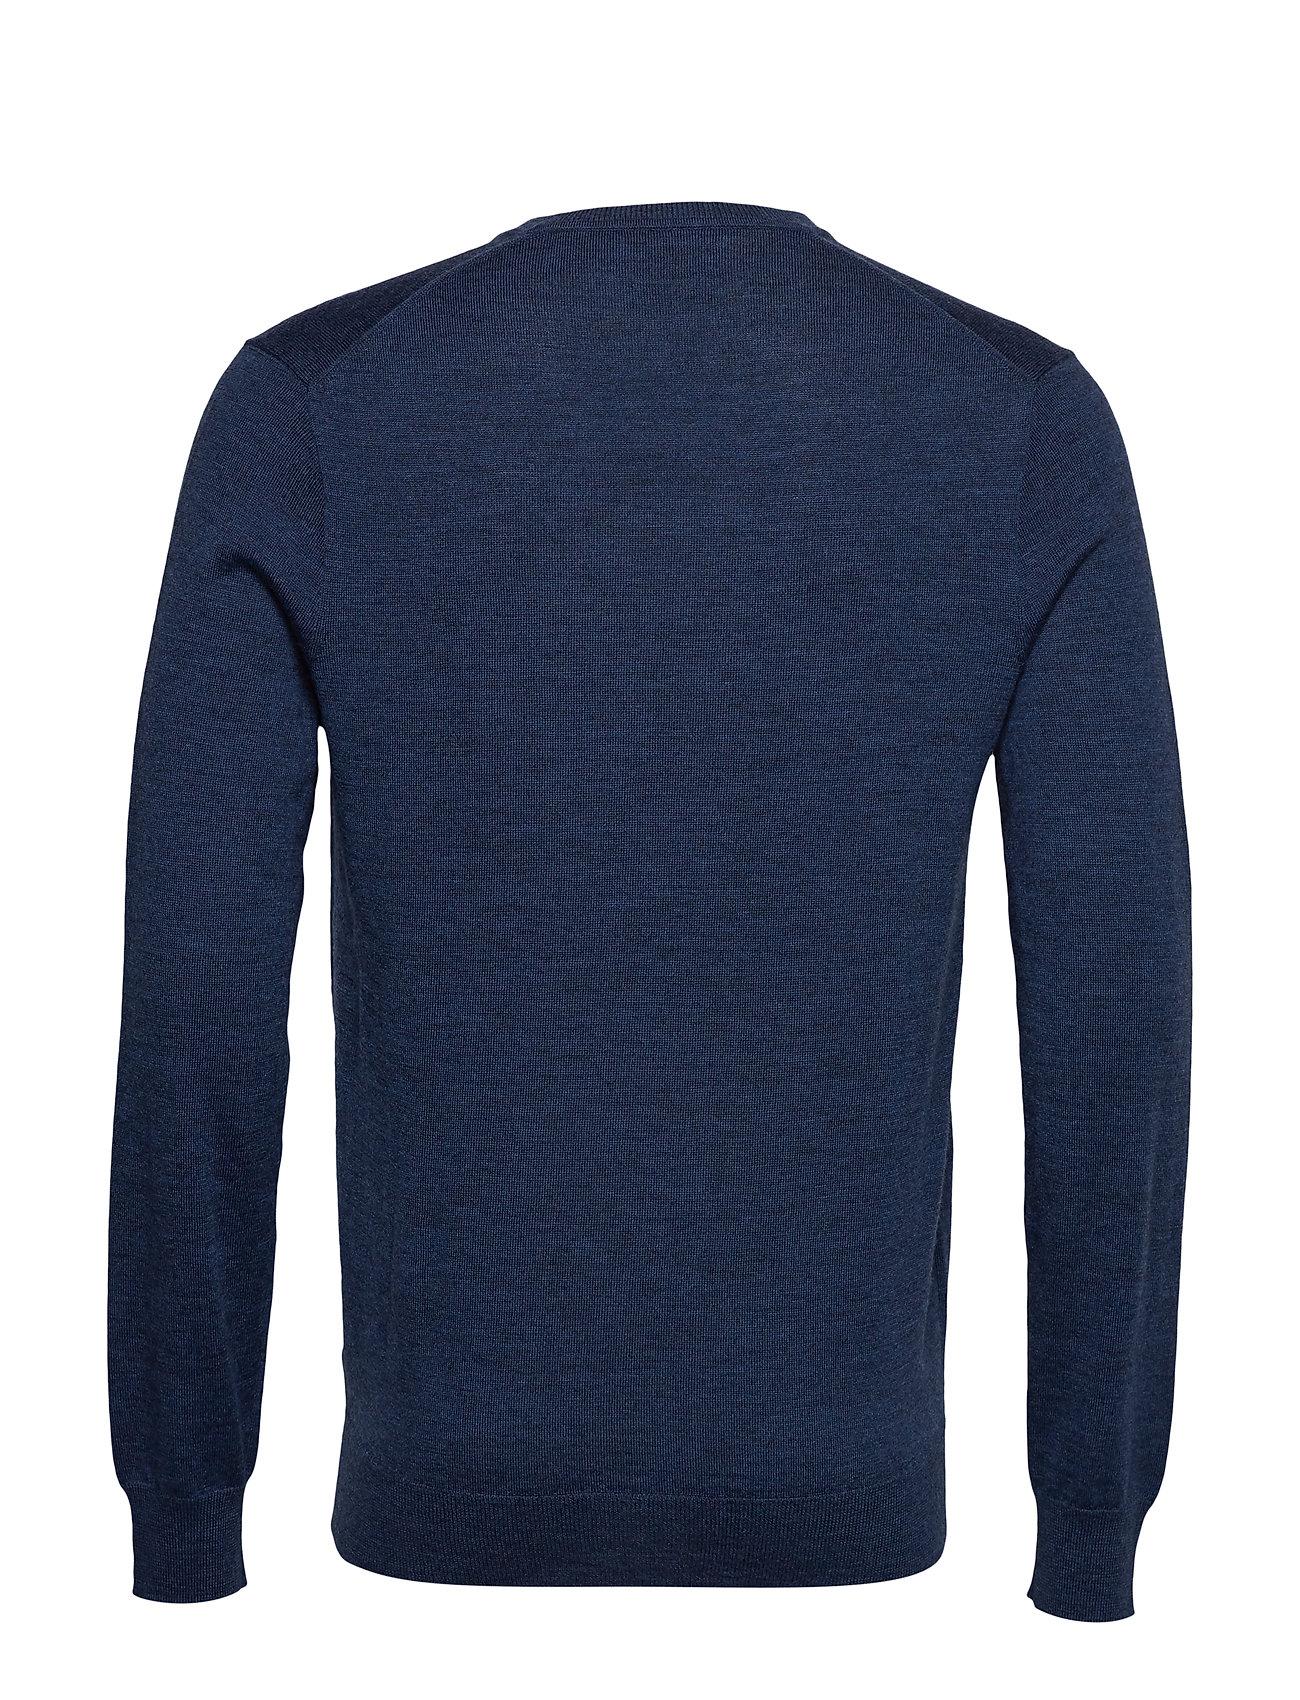 HeatPolo Lauren Pp Sleeve Ls Ralph Blue Vn sweaterfederal long Sf K13TFcJl